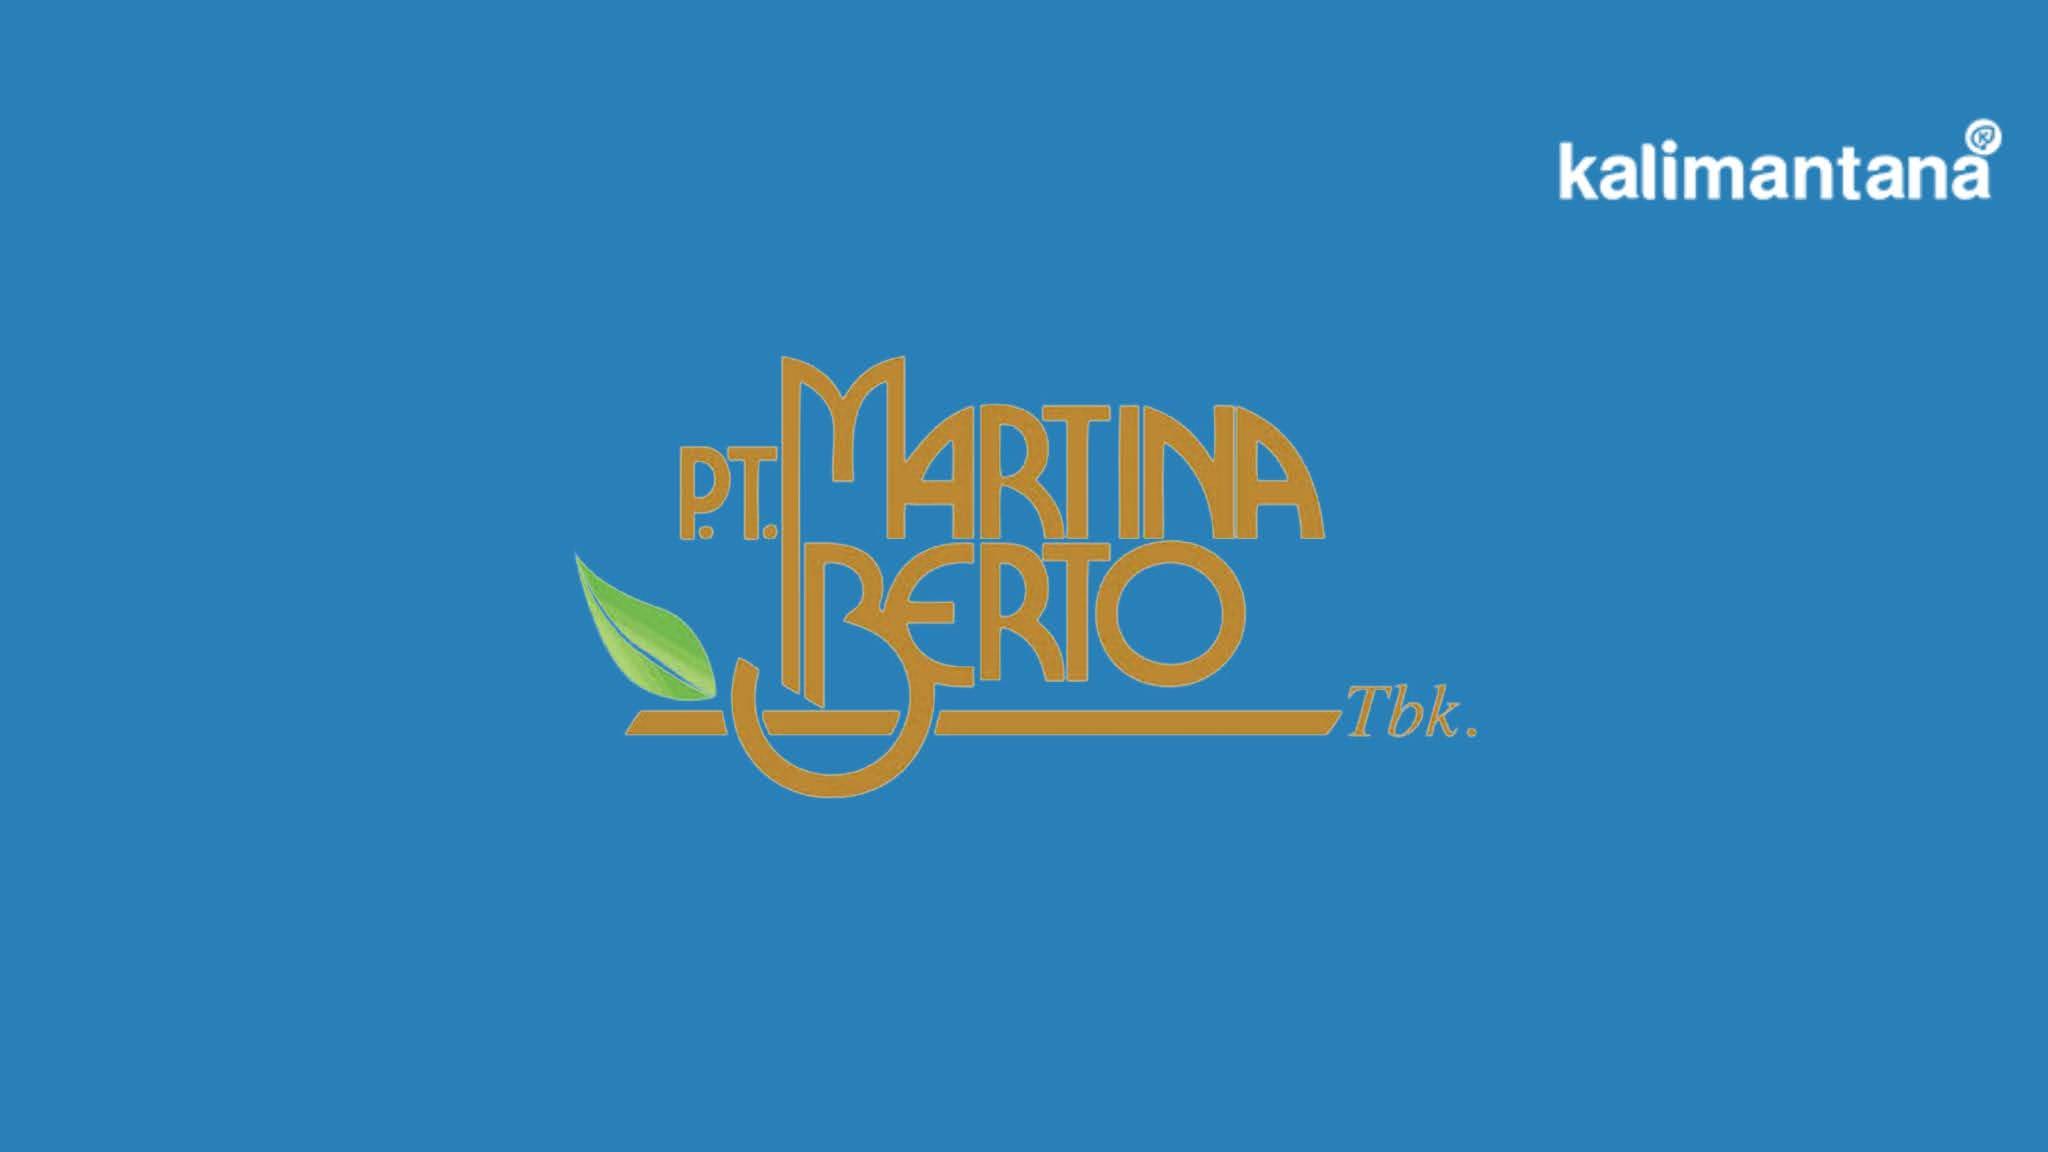 PT Martina Berto